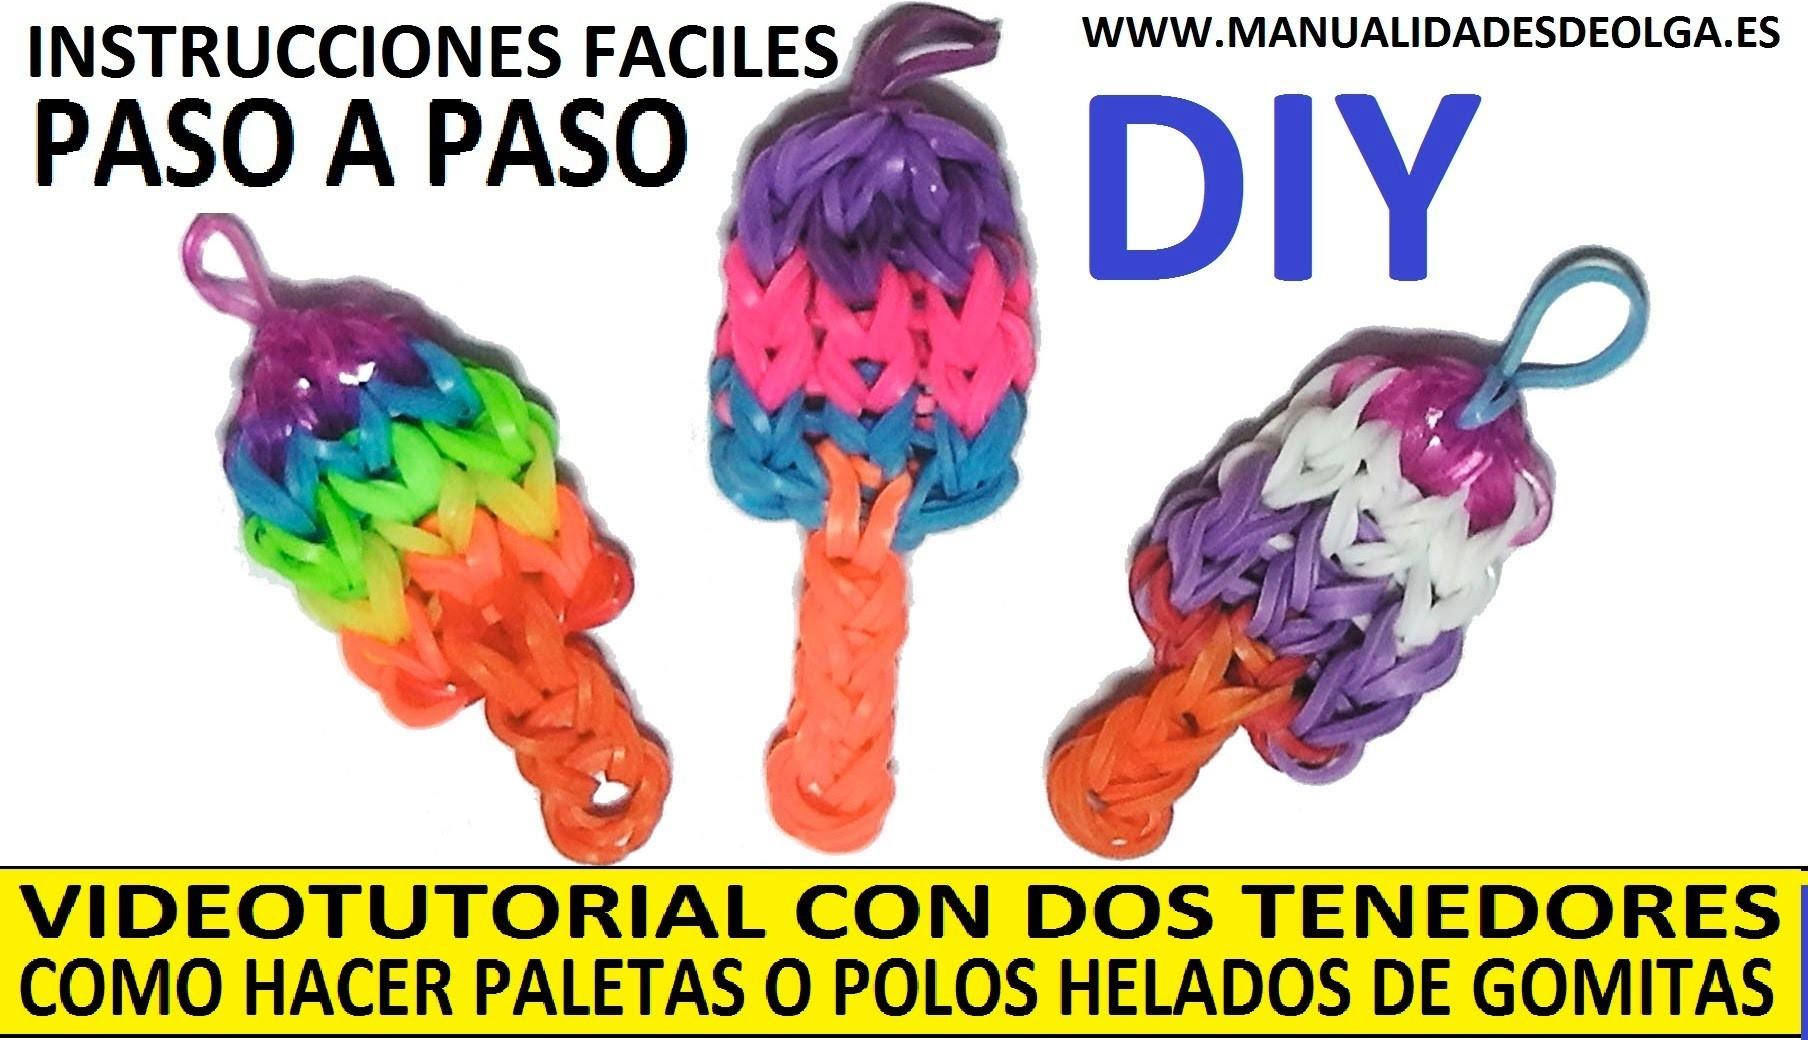 COMO HACER PALETAS O POLOS HELADOS DE GOMITAS (LIGAS) CHARMS CON DOS TENEDORES. TUTORIAL DIY